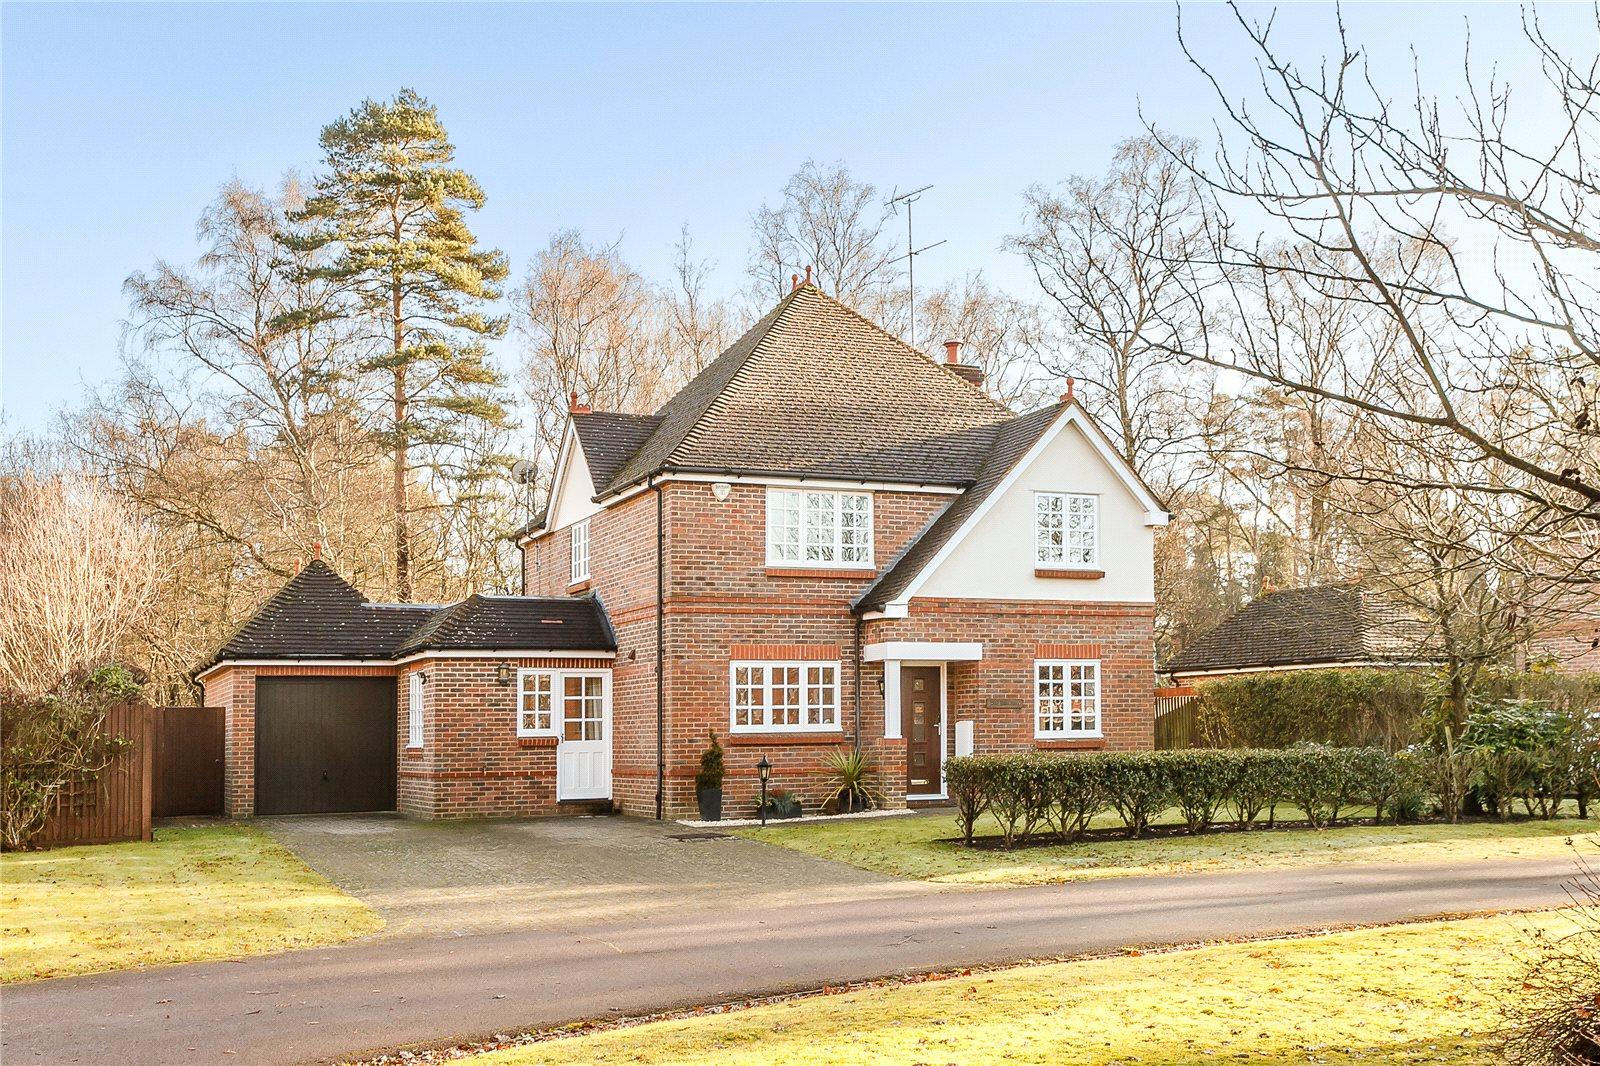 Villa per Vendita alle ore Kings Ride, Ascot, Berkshire, SL5 Ascot, Inghilterra